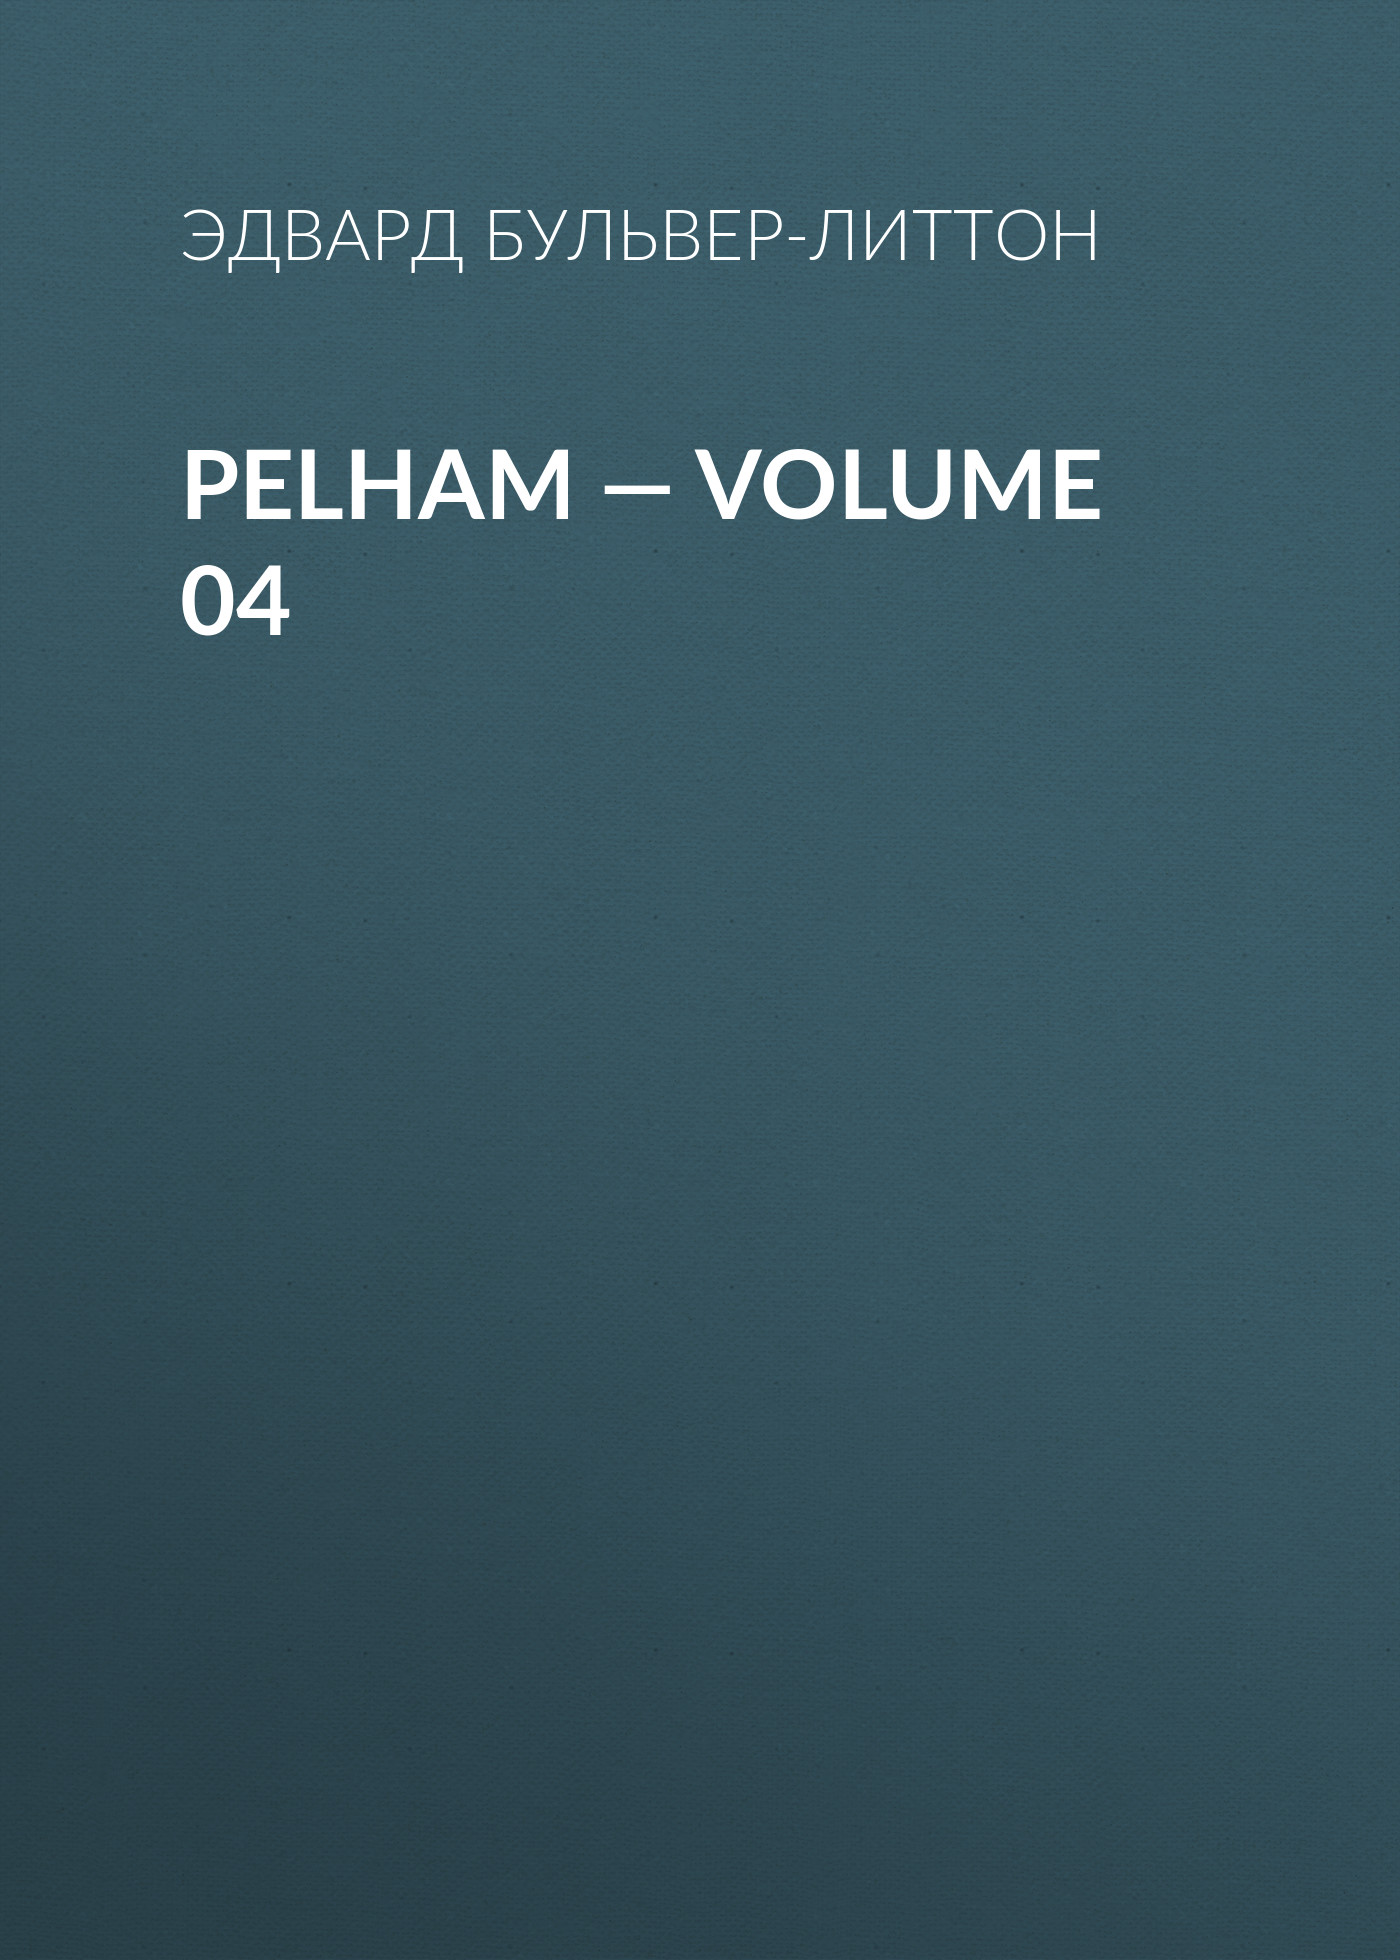 Эдвард Бульвер-Литтон Pelham — Volume 04 эдвард бульвер литтон ernest maltravers volume 04